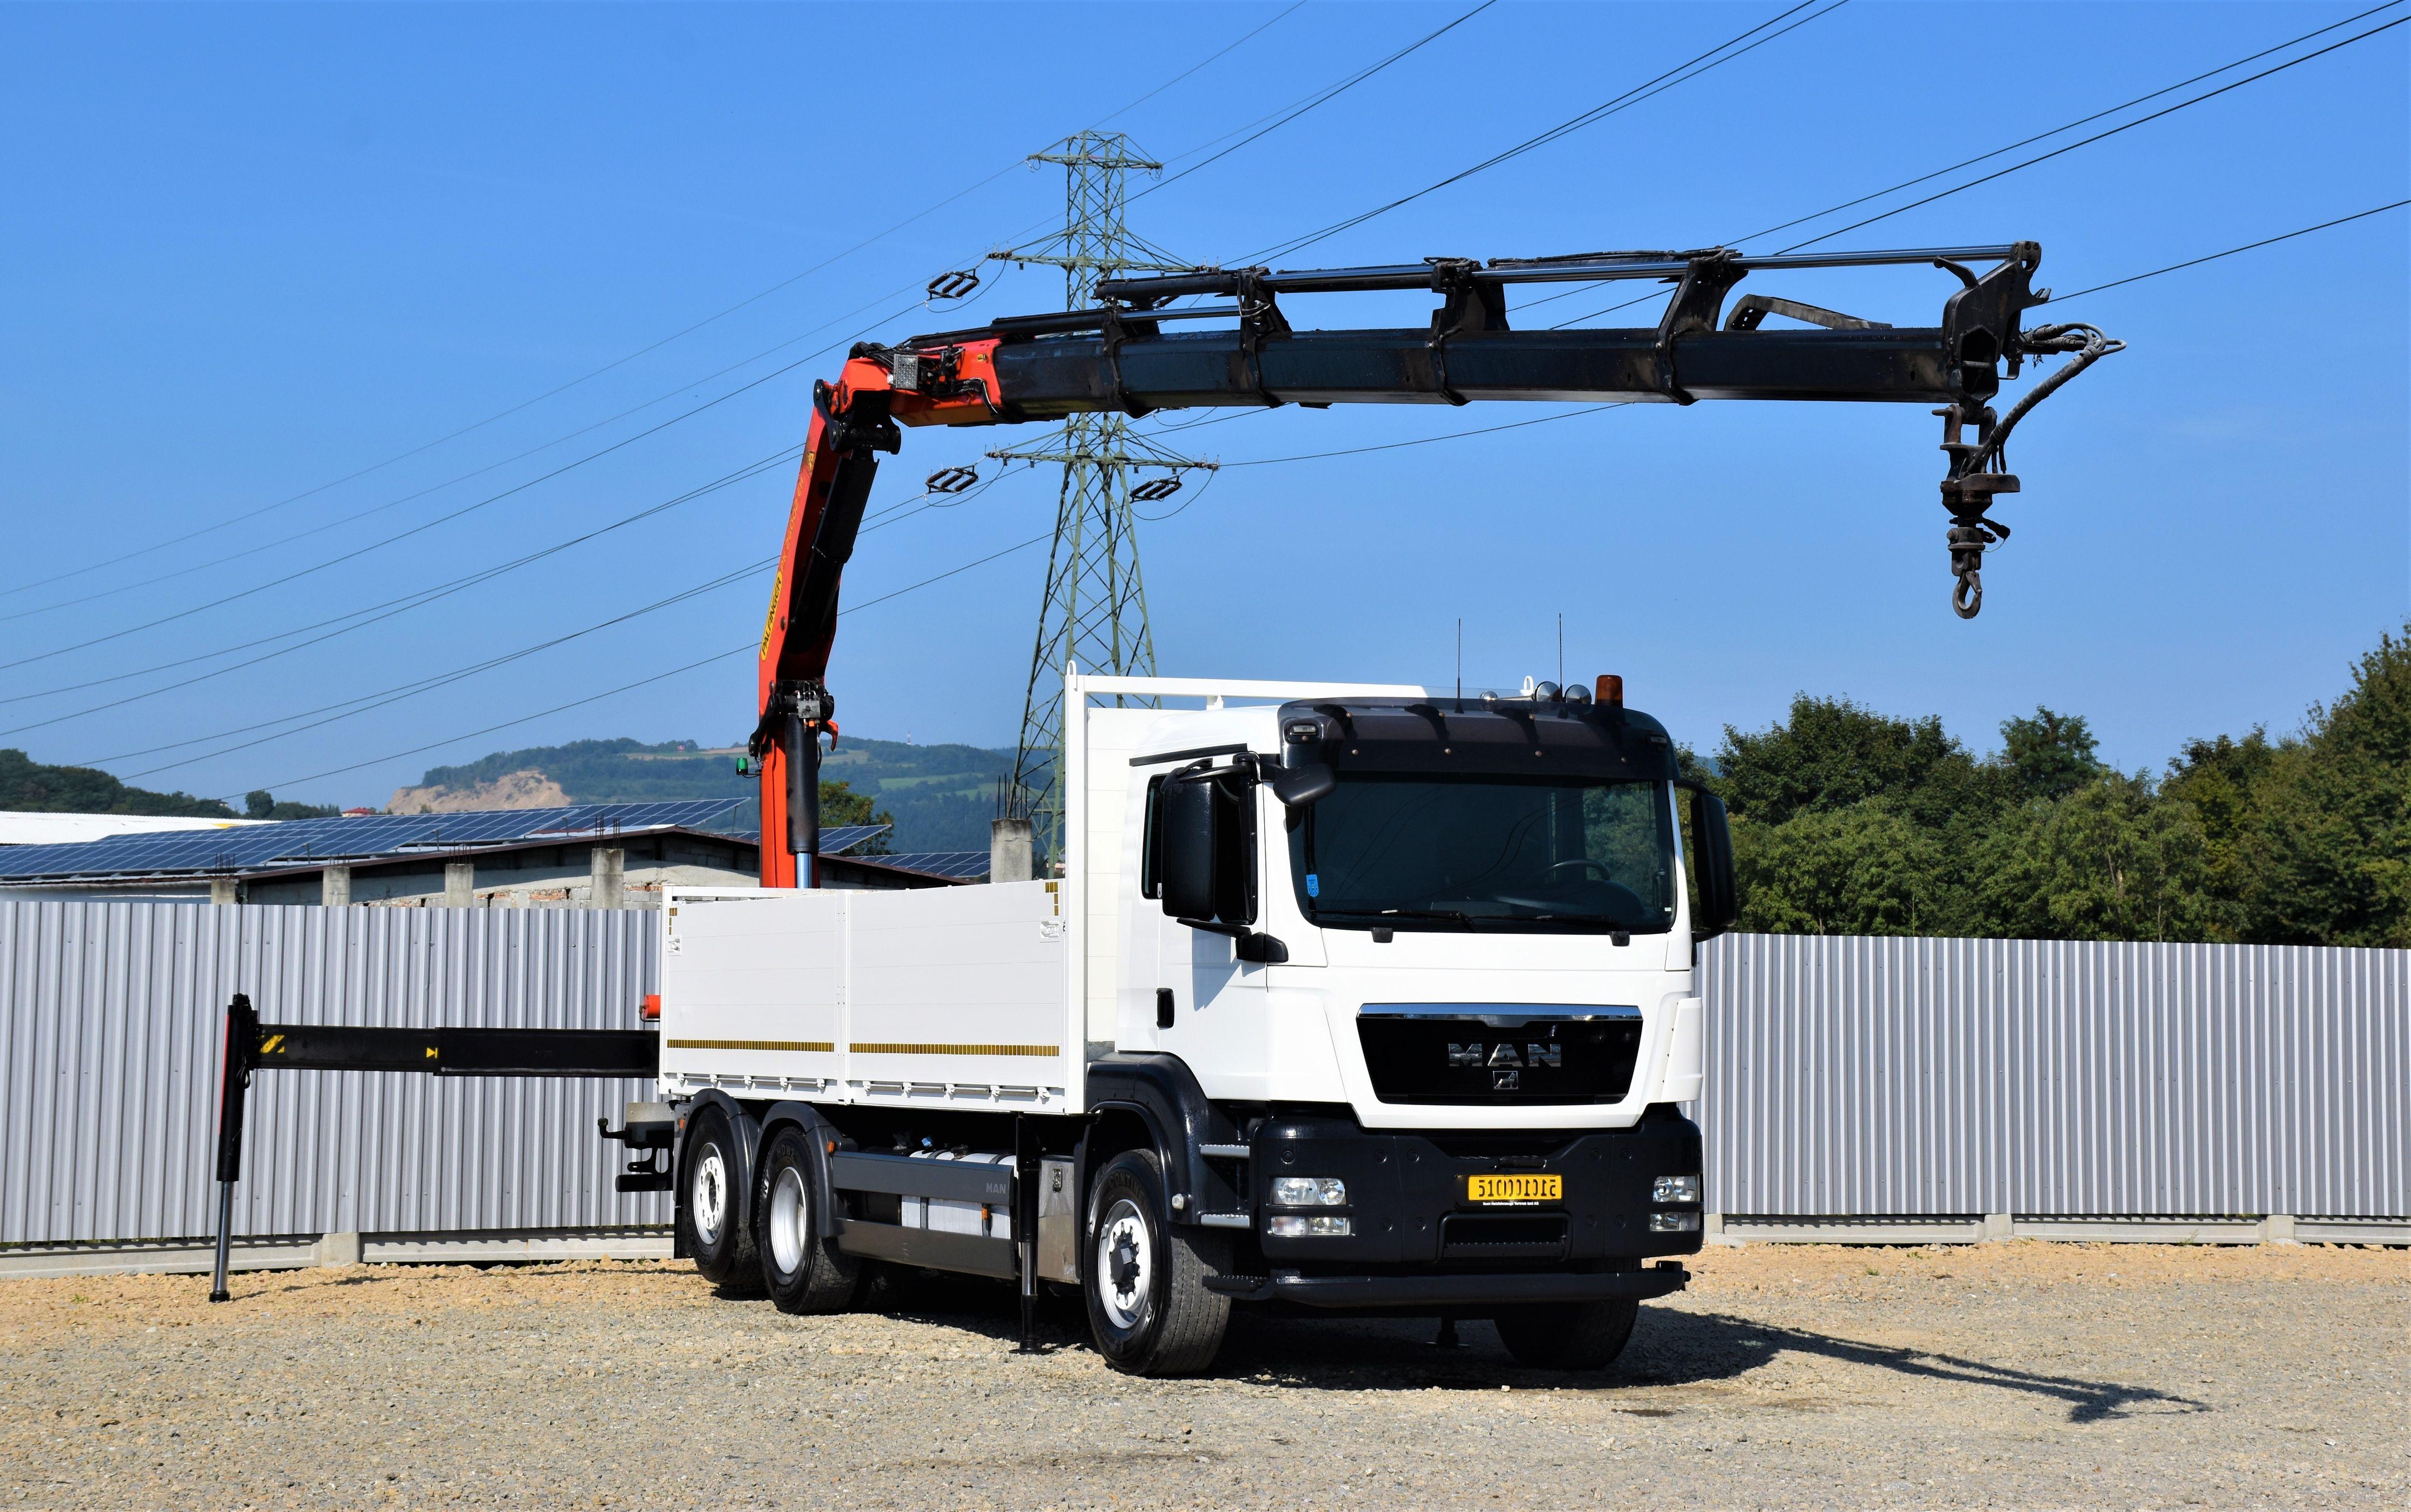 2012-man-tgs-26-440-445024-equipment-cover-image